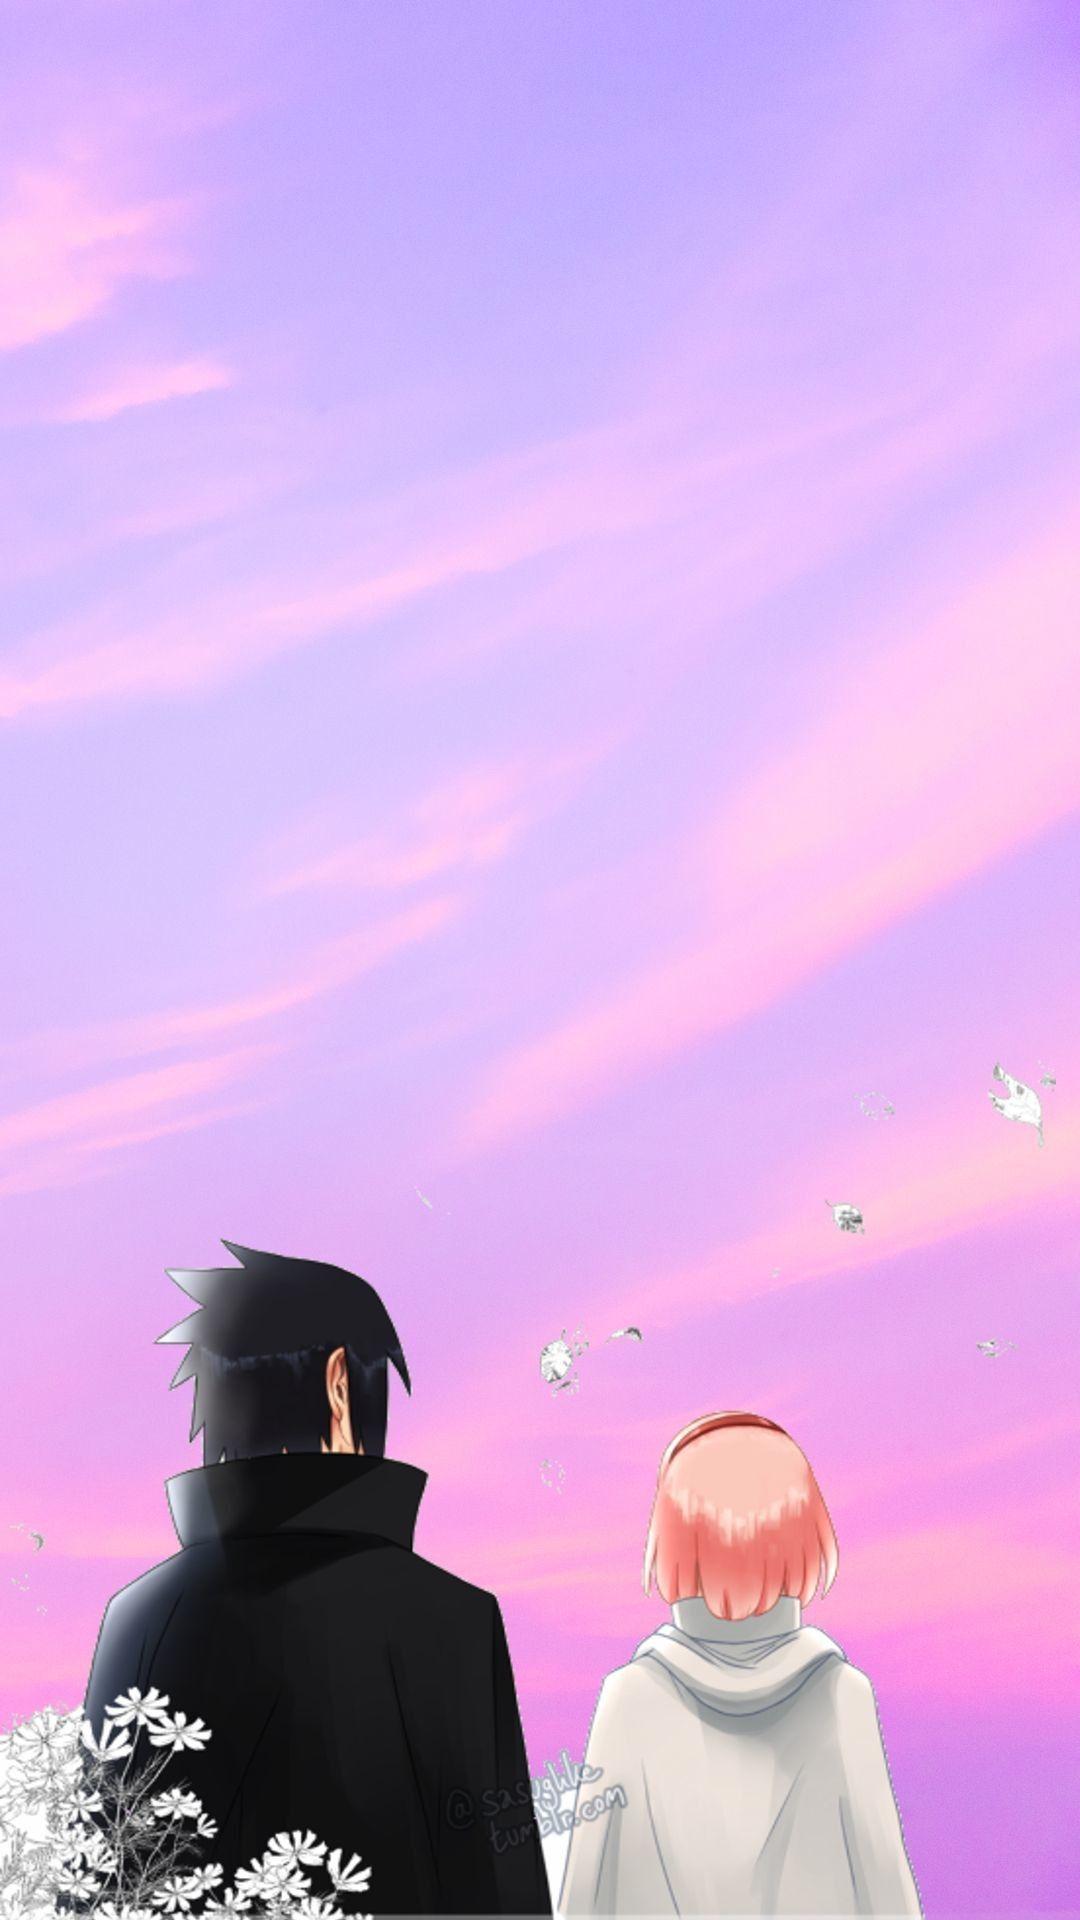 Sasuke And Sakura Wallpapers 68 Pictures Gambar Manga Gambar Gambar Anime